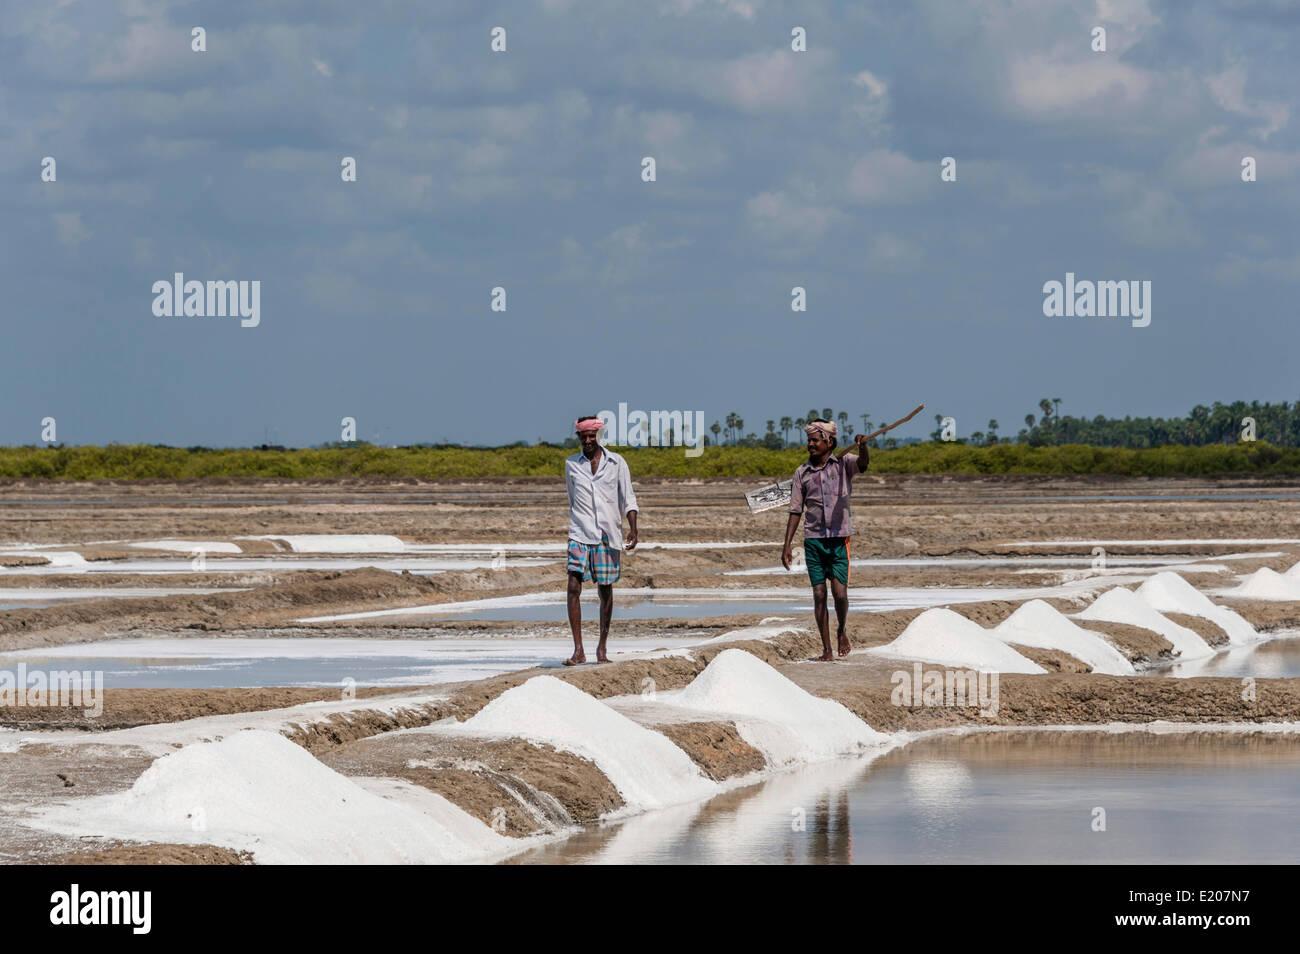 Saline workers, salt production, saltworks, near Thazhankadu, Tamil Nadu, India - Stock Image